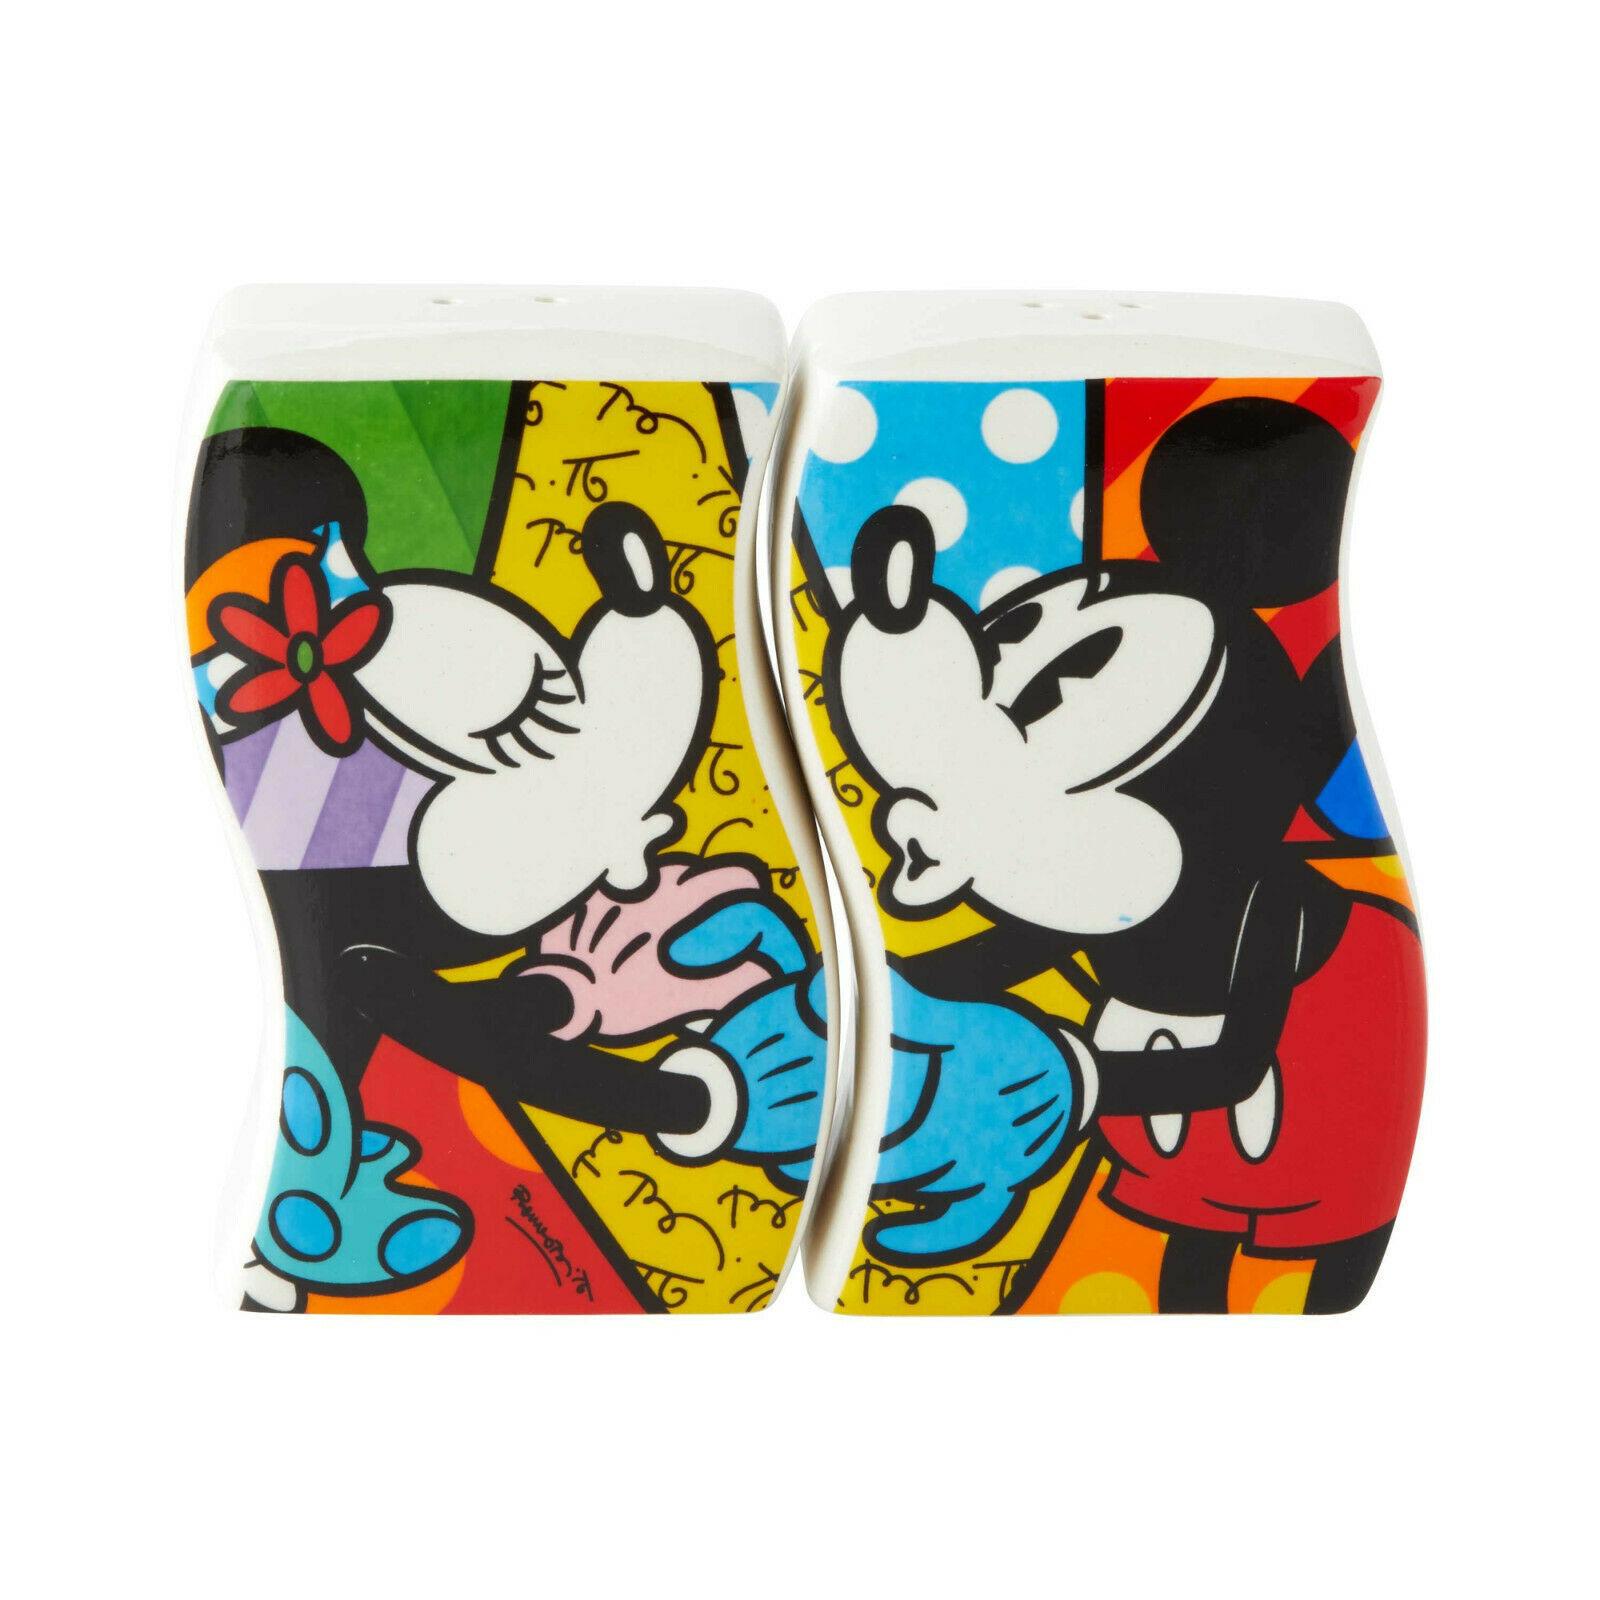 "Disney Britto 3"" high Mickey & Minnie Design Salt & Pepper Shakers Set"